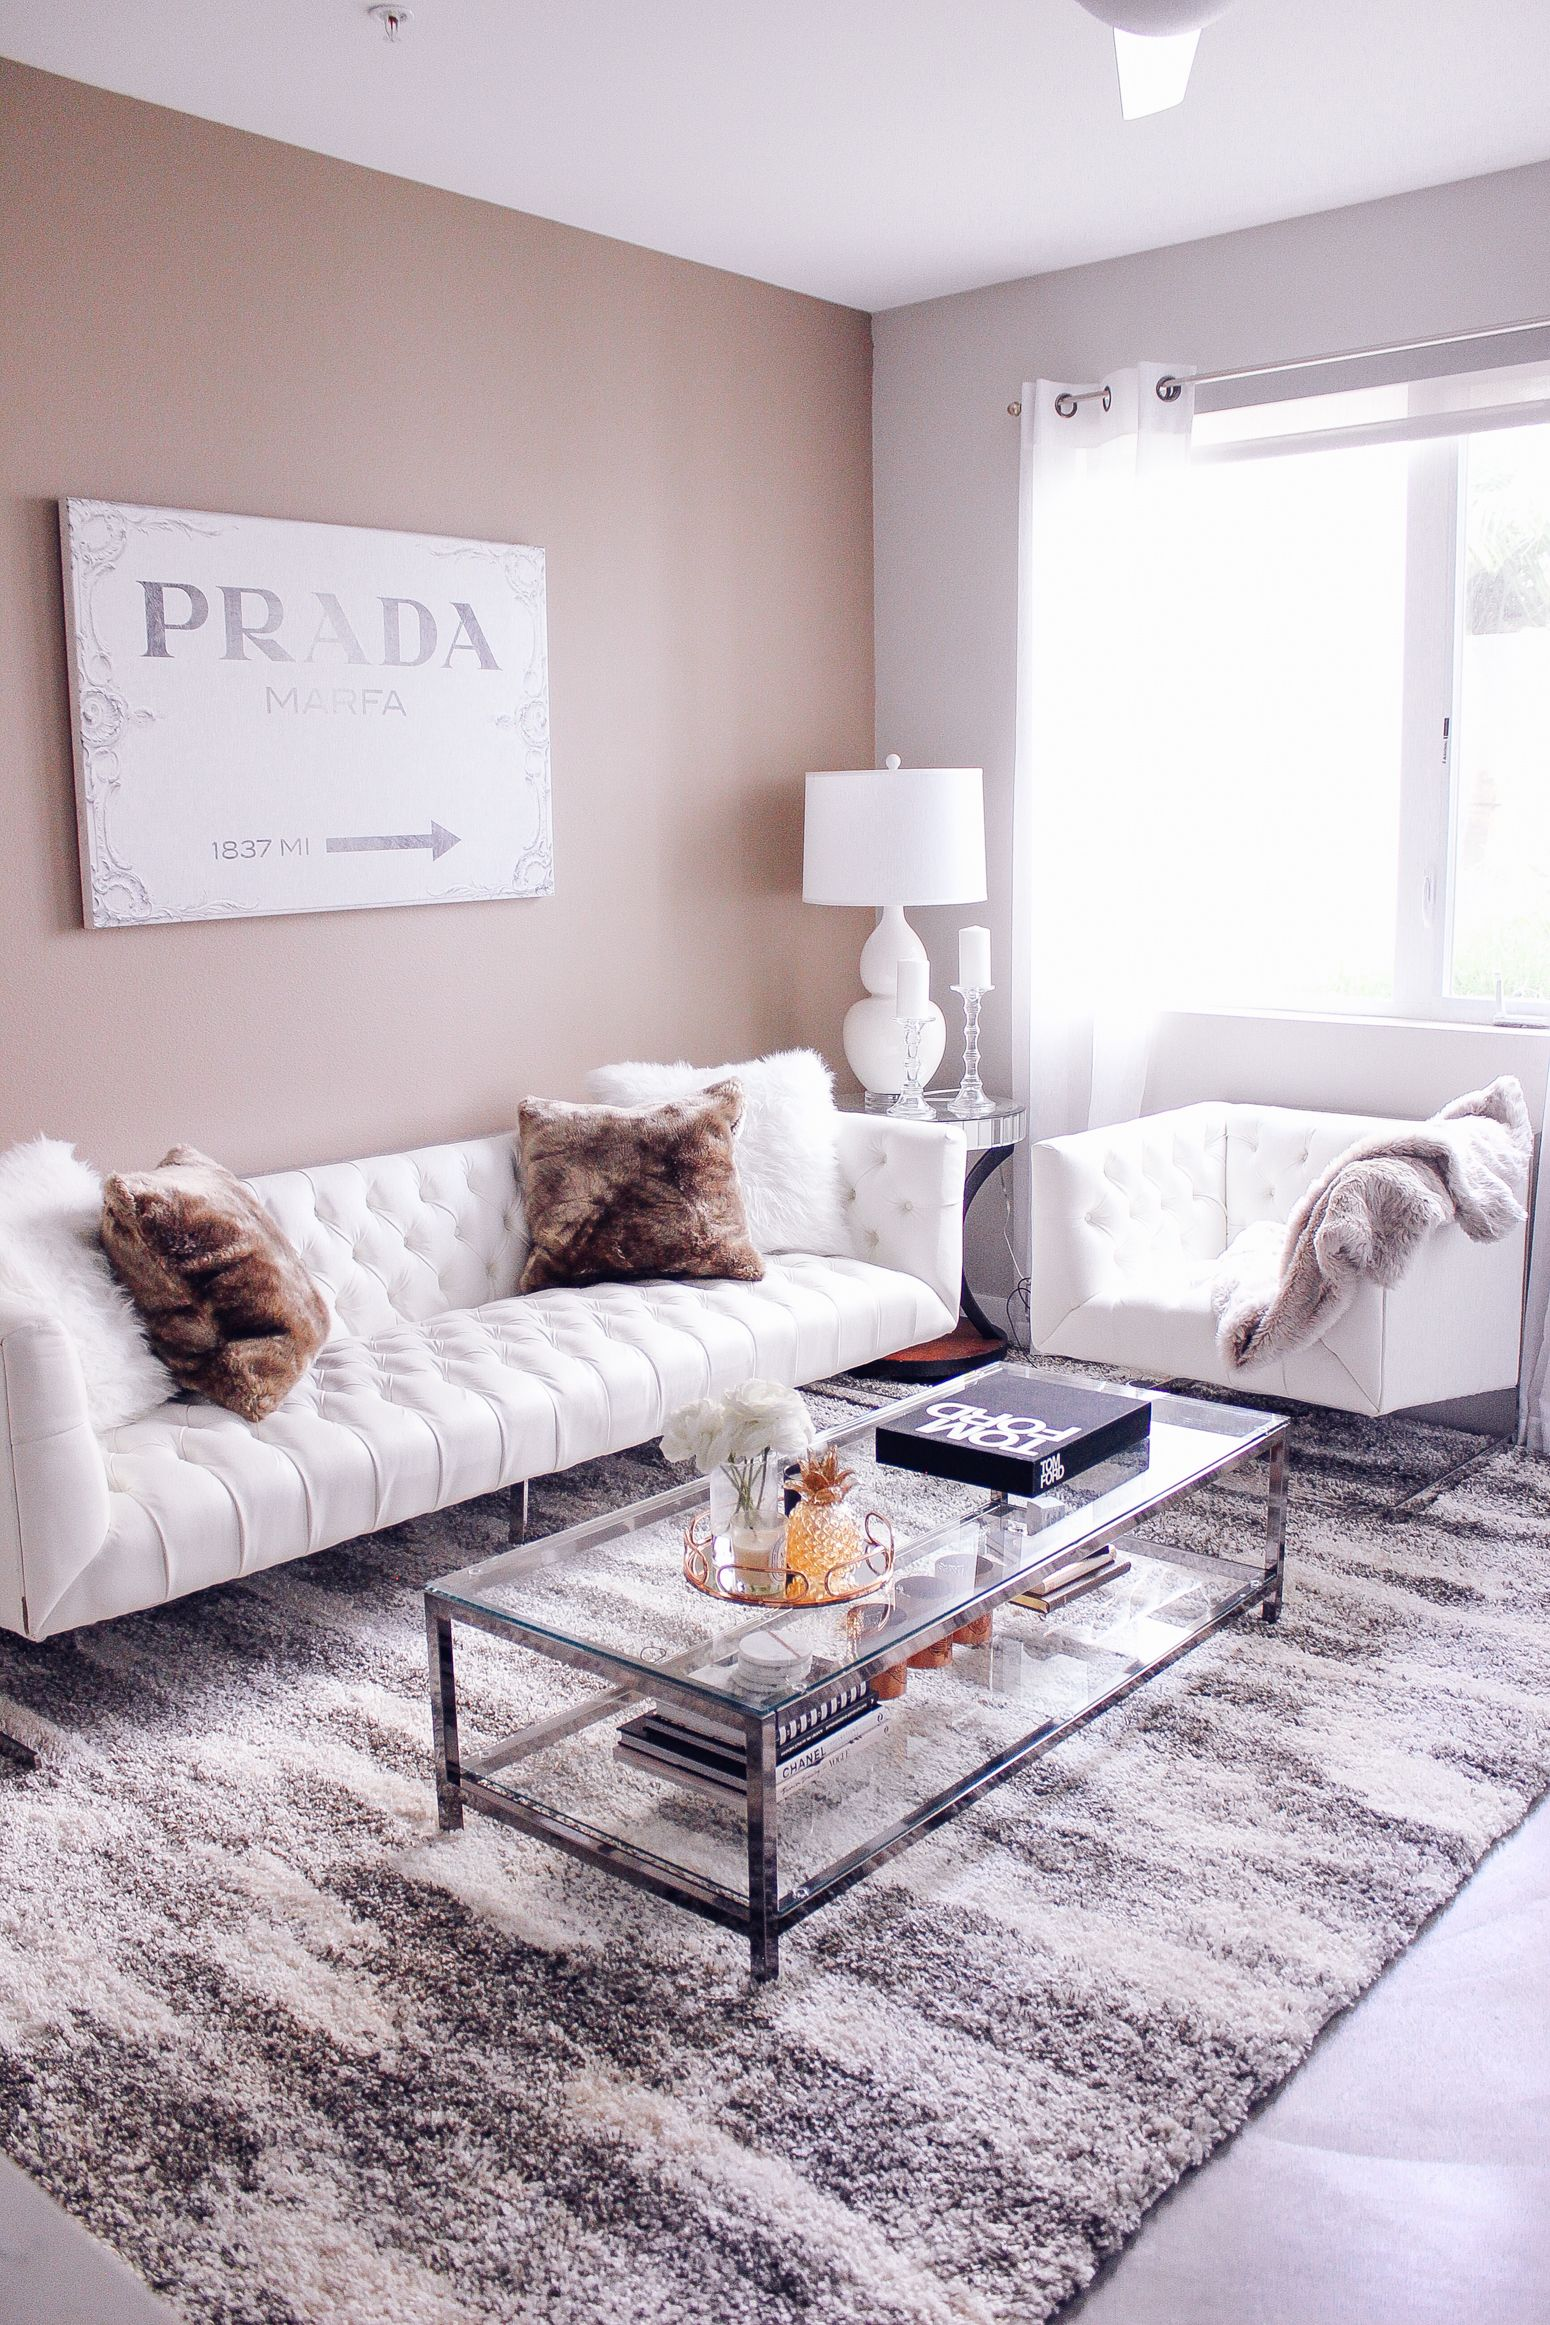 My Apartment Living Room Decor Reveal 2017 Living Room Decor